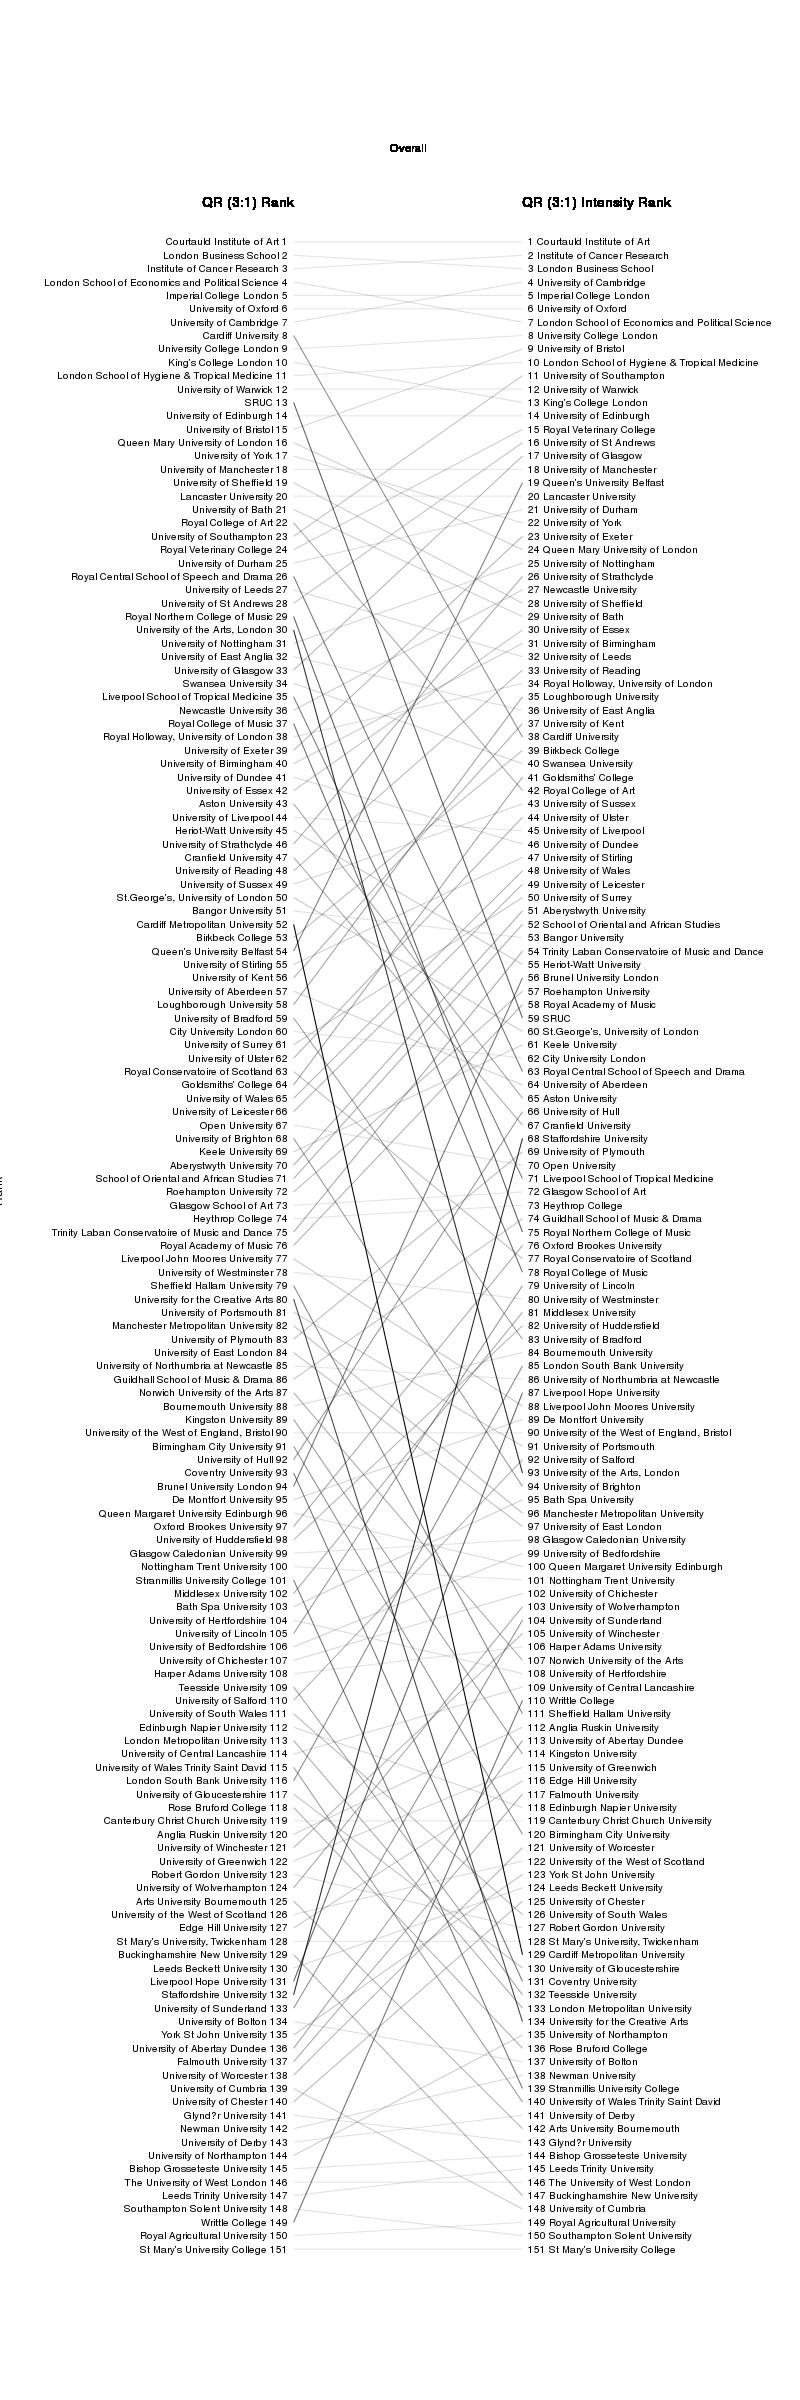 autotuning bandit algorithm